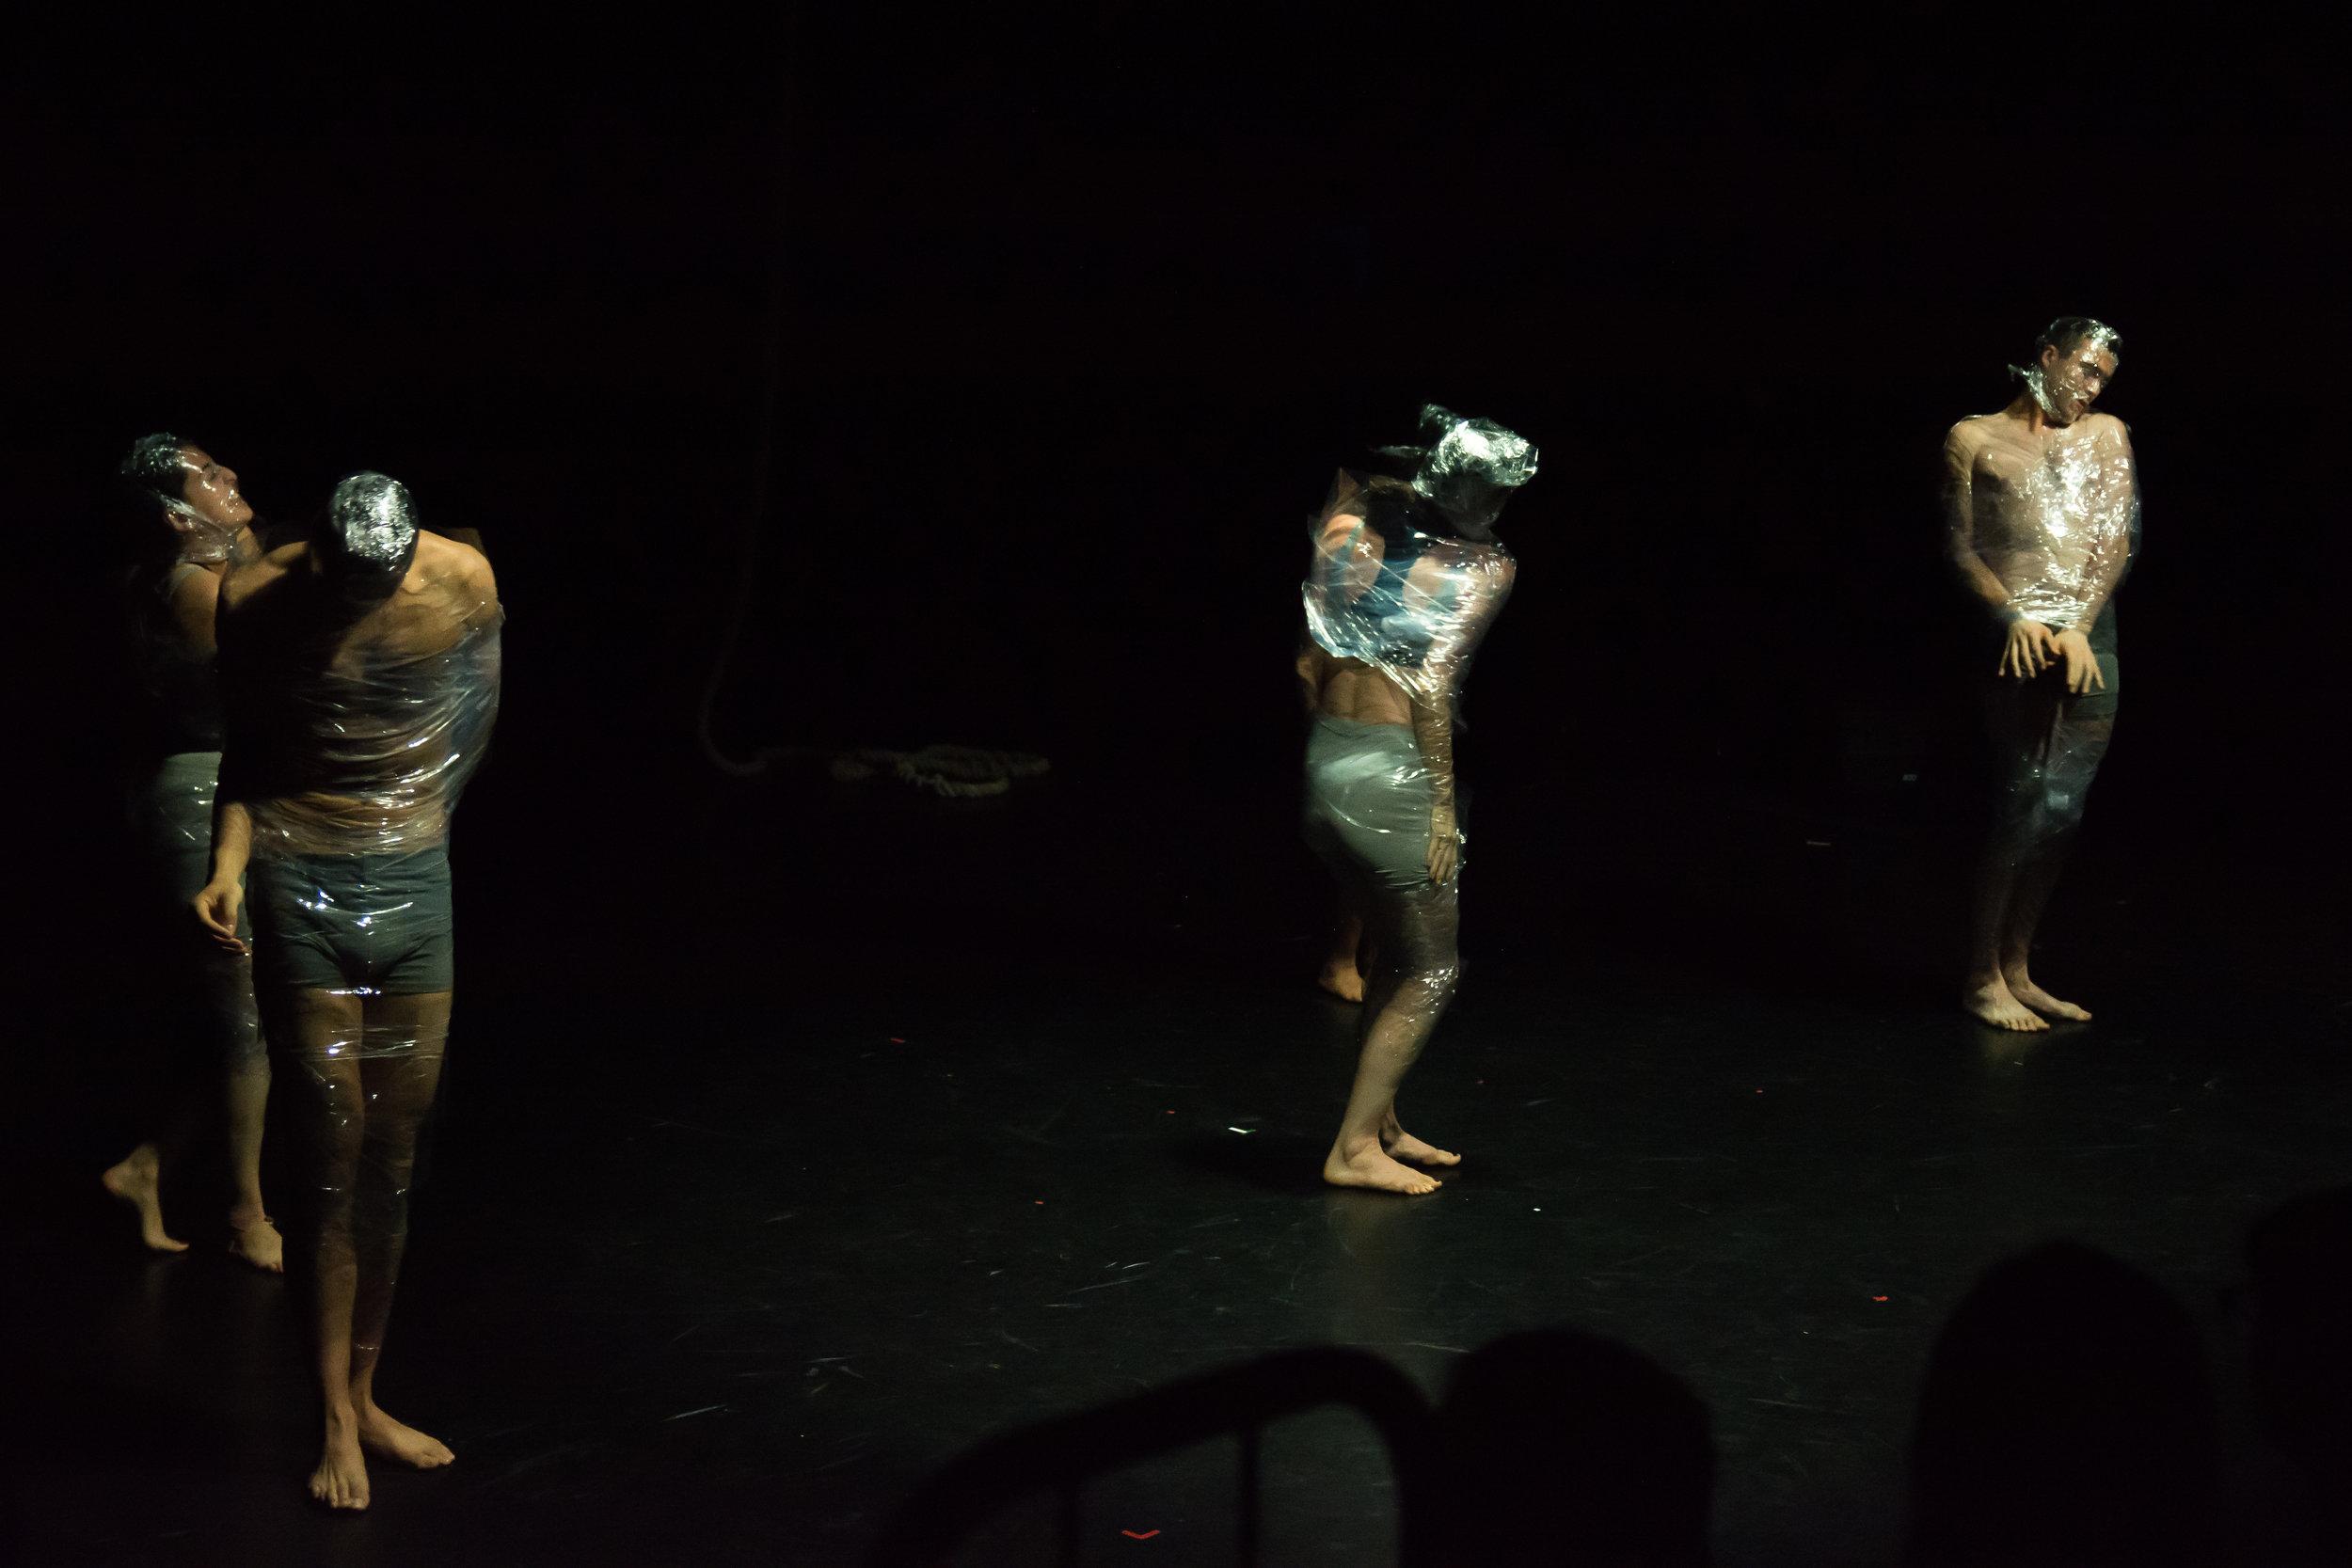 The performers beginning to break free